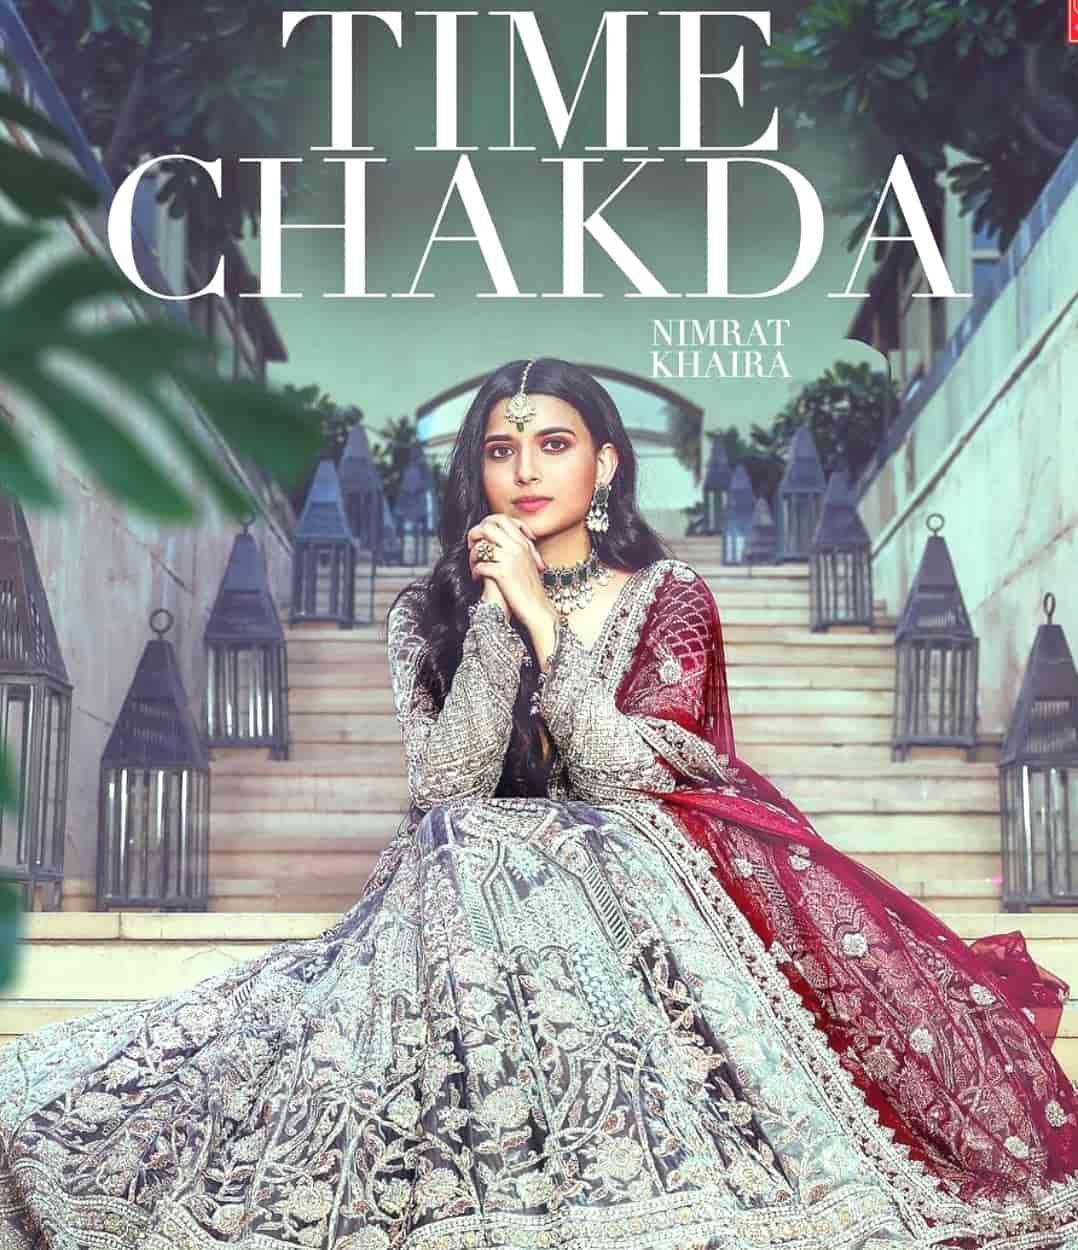 Time Chakda Punjabi Song Image Features Nimrat Khaira